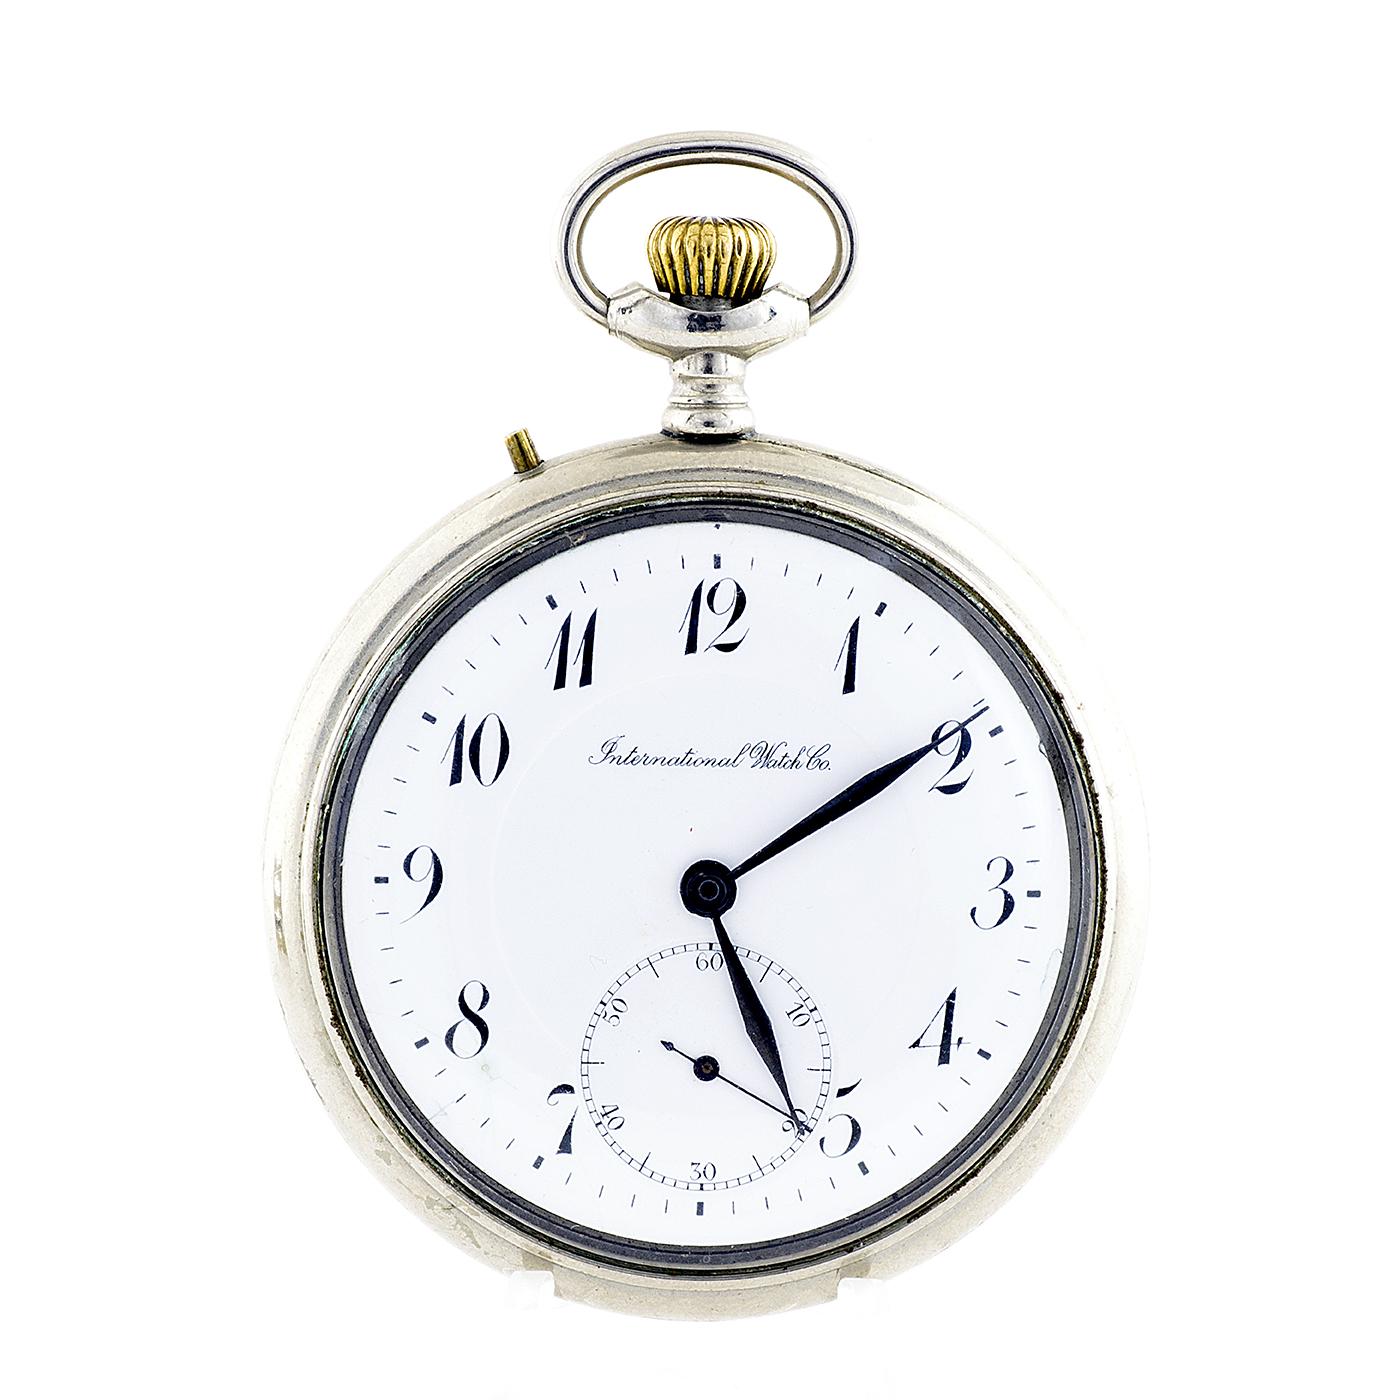 International Watch Company (IWC). Reloj de bolsillo, lepine y remontoir. Ca. ?.